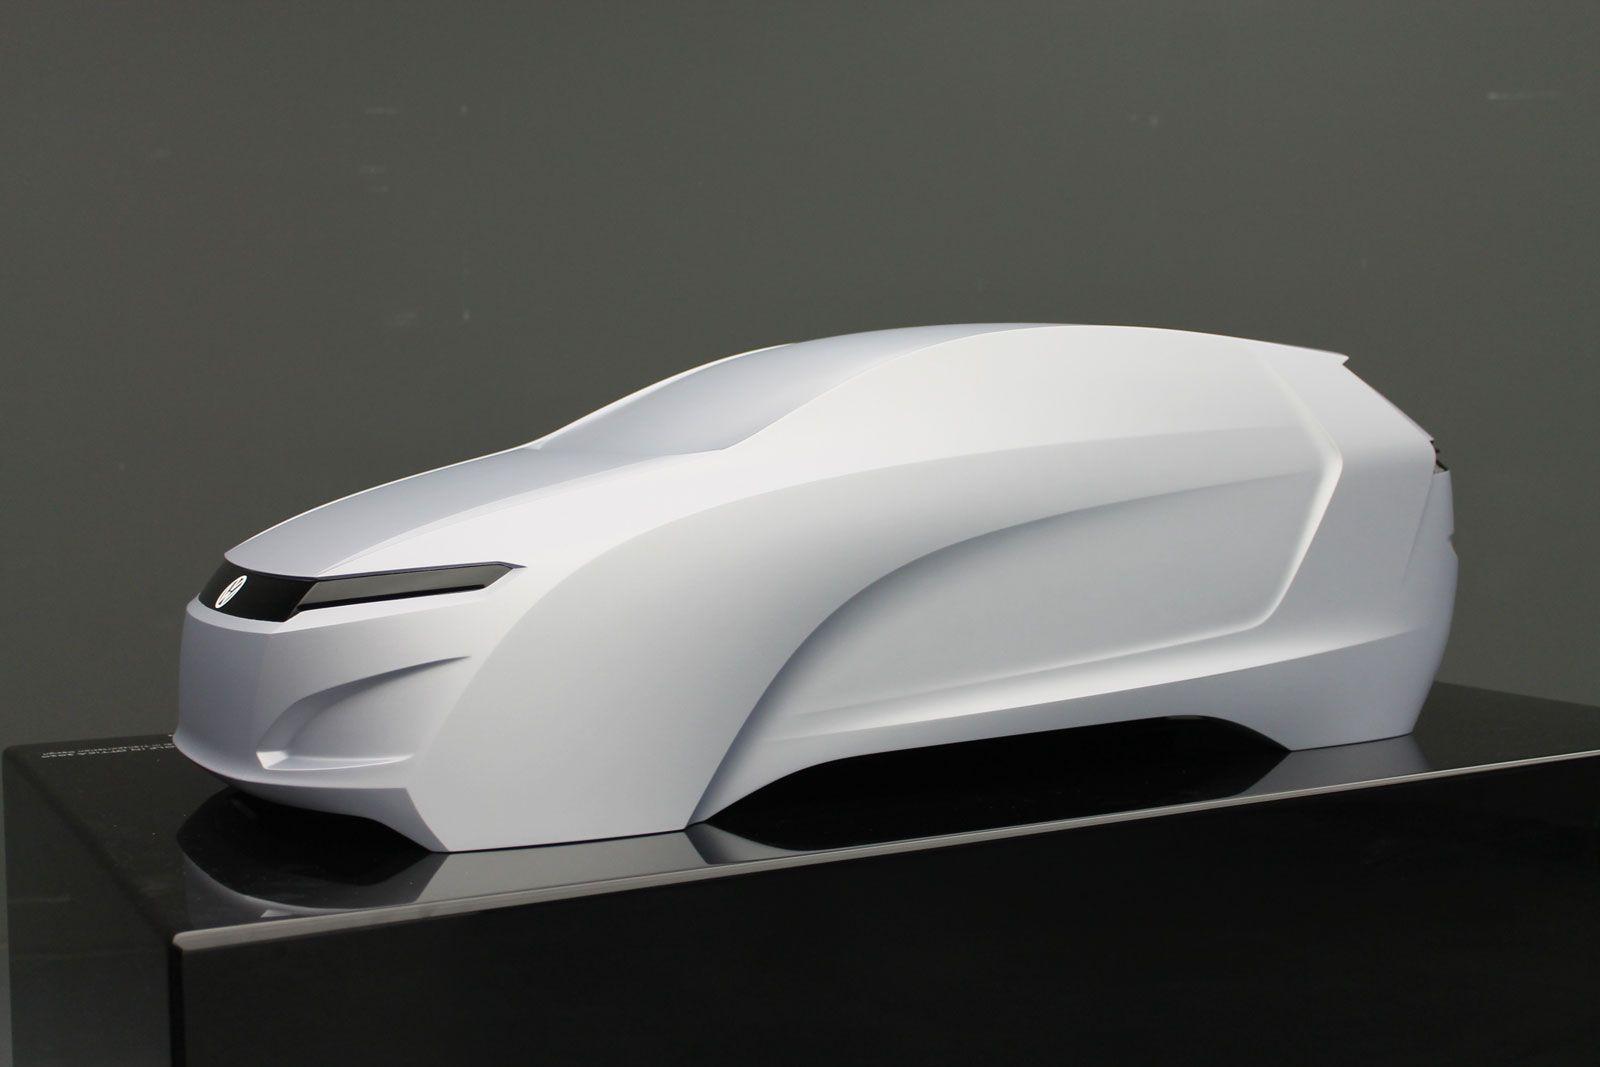 Volkswagen Golf Vision 2020 Concept Scale Model Car Body Design Ooooo Scale Models Car Scale Models Cars